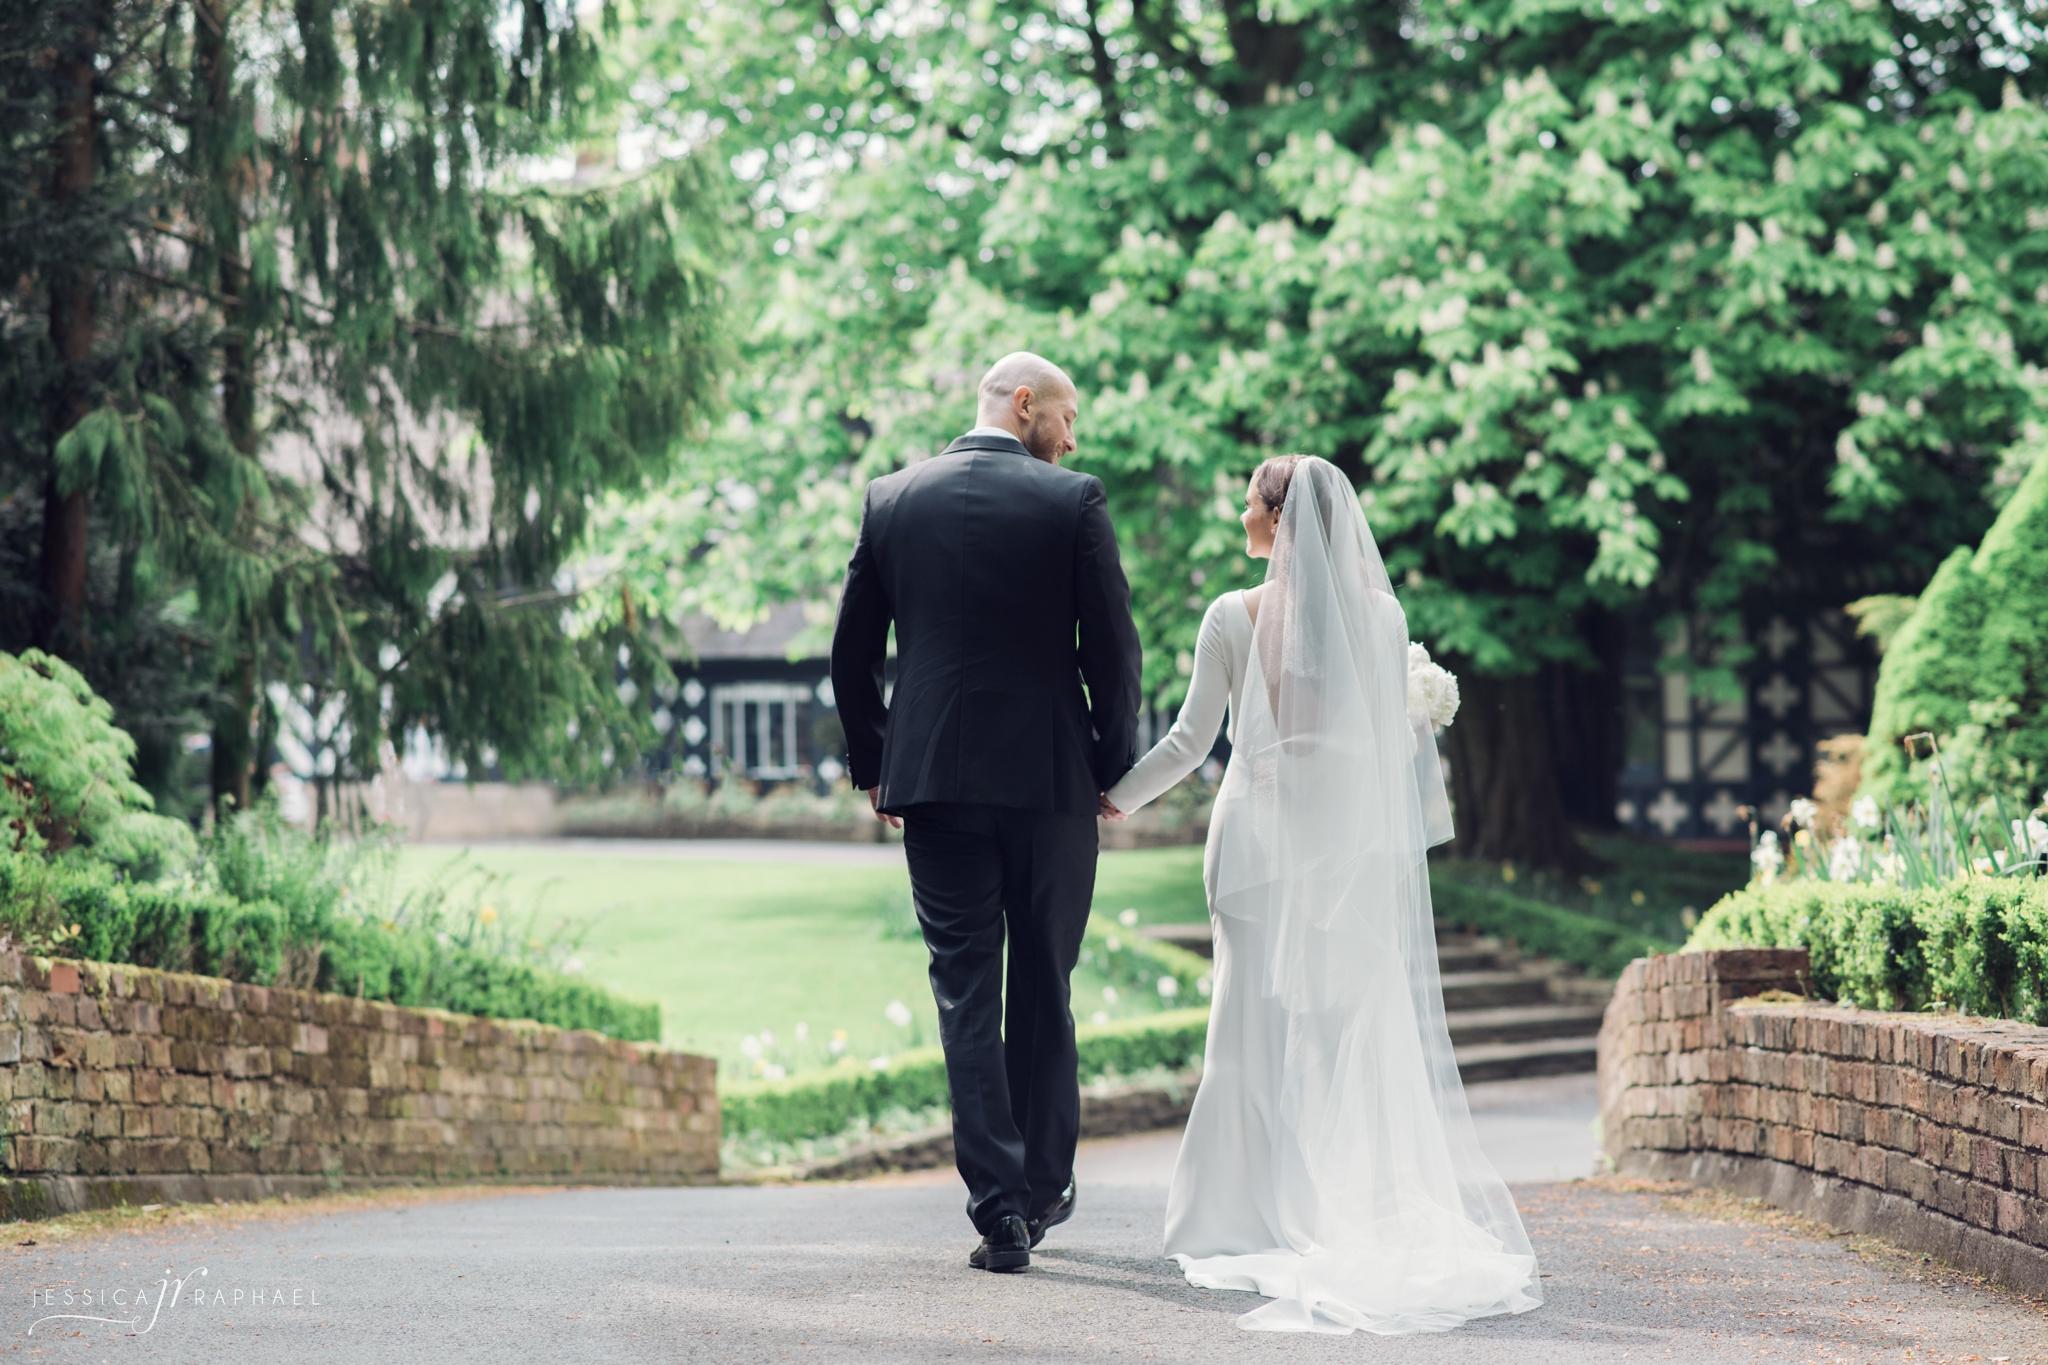 samlesbury-hall-weddings-samlesbury-hall-wedding-photographer-midsummer-nights-dream-jessica-raphael-photography